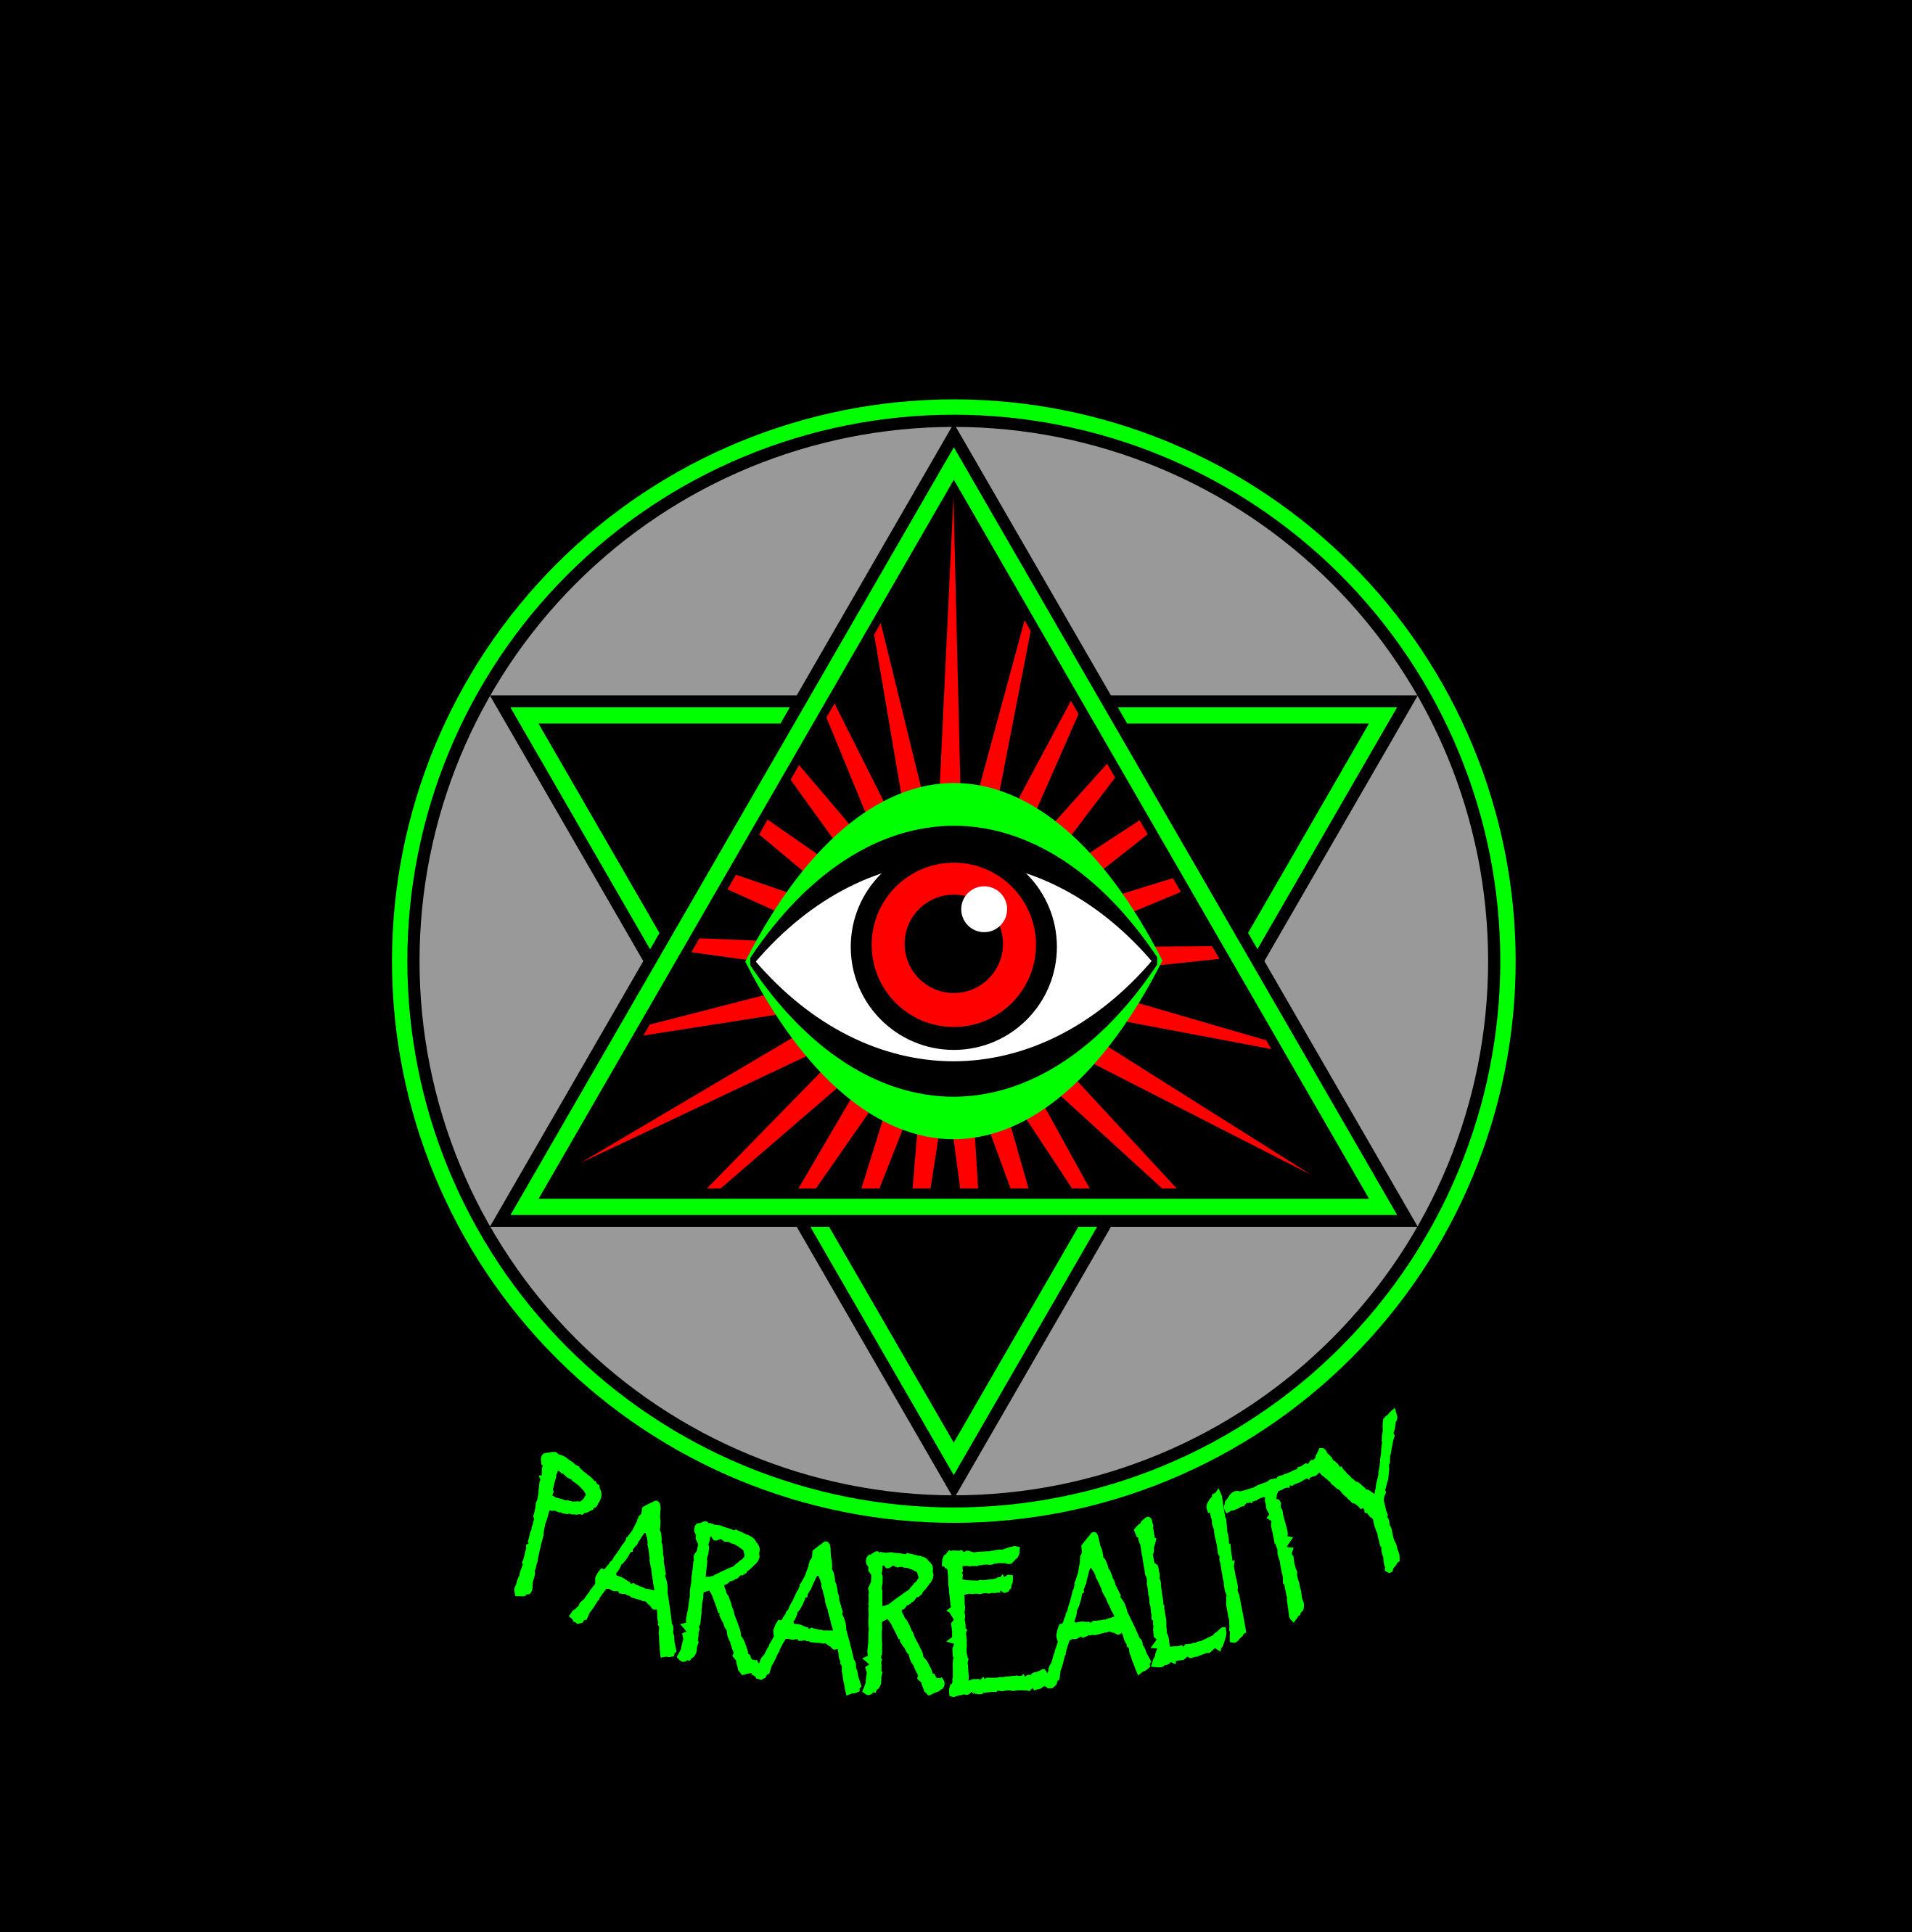 ParaReality